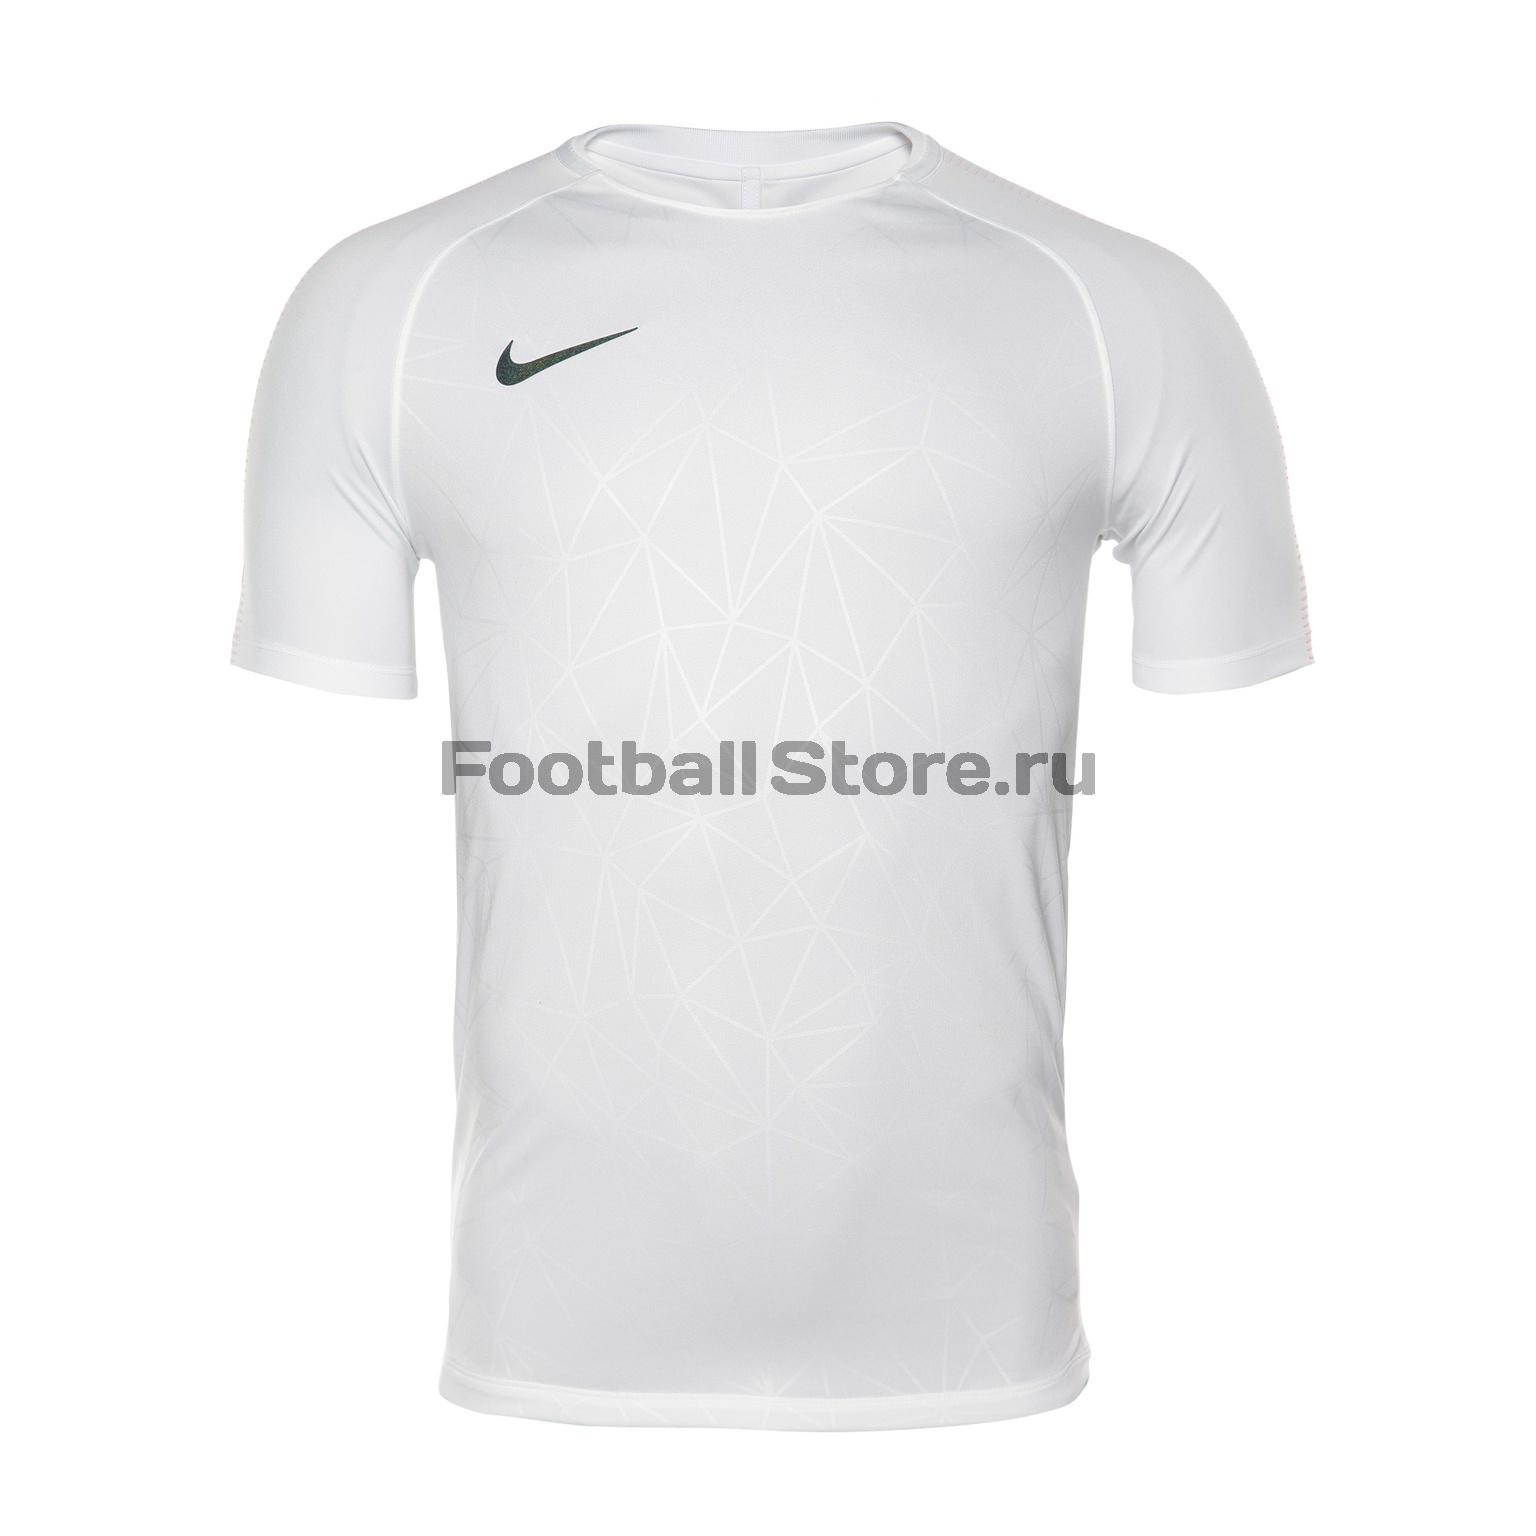 Футболка тренировочная Nike CR7 Squad Top 882991-100